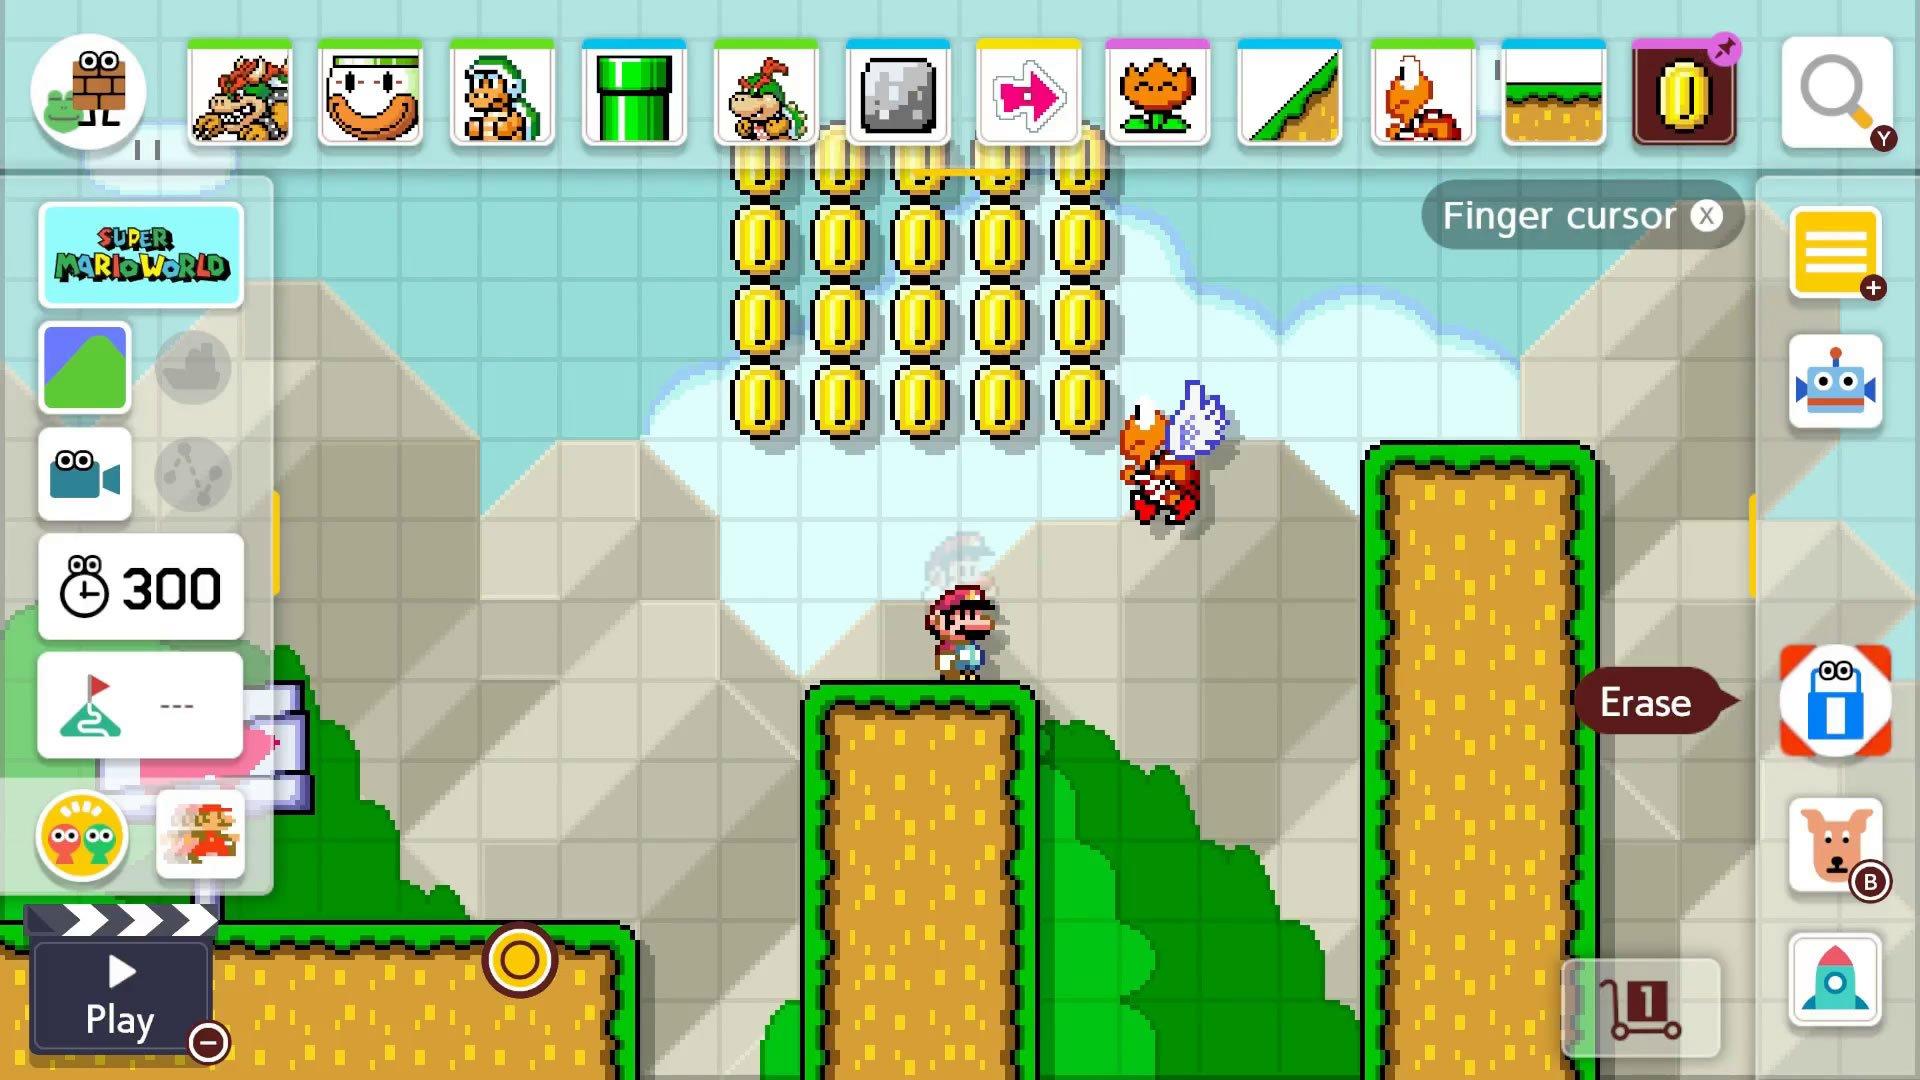 Super Mario Maker 2 Course Maker - Set Clear Conditions button